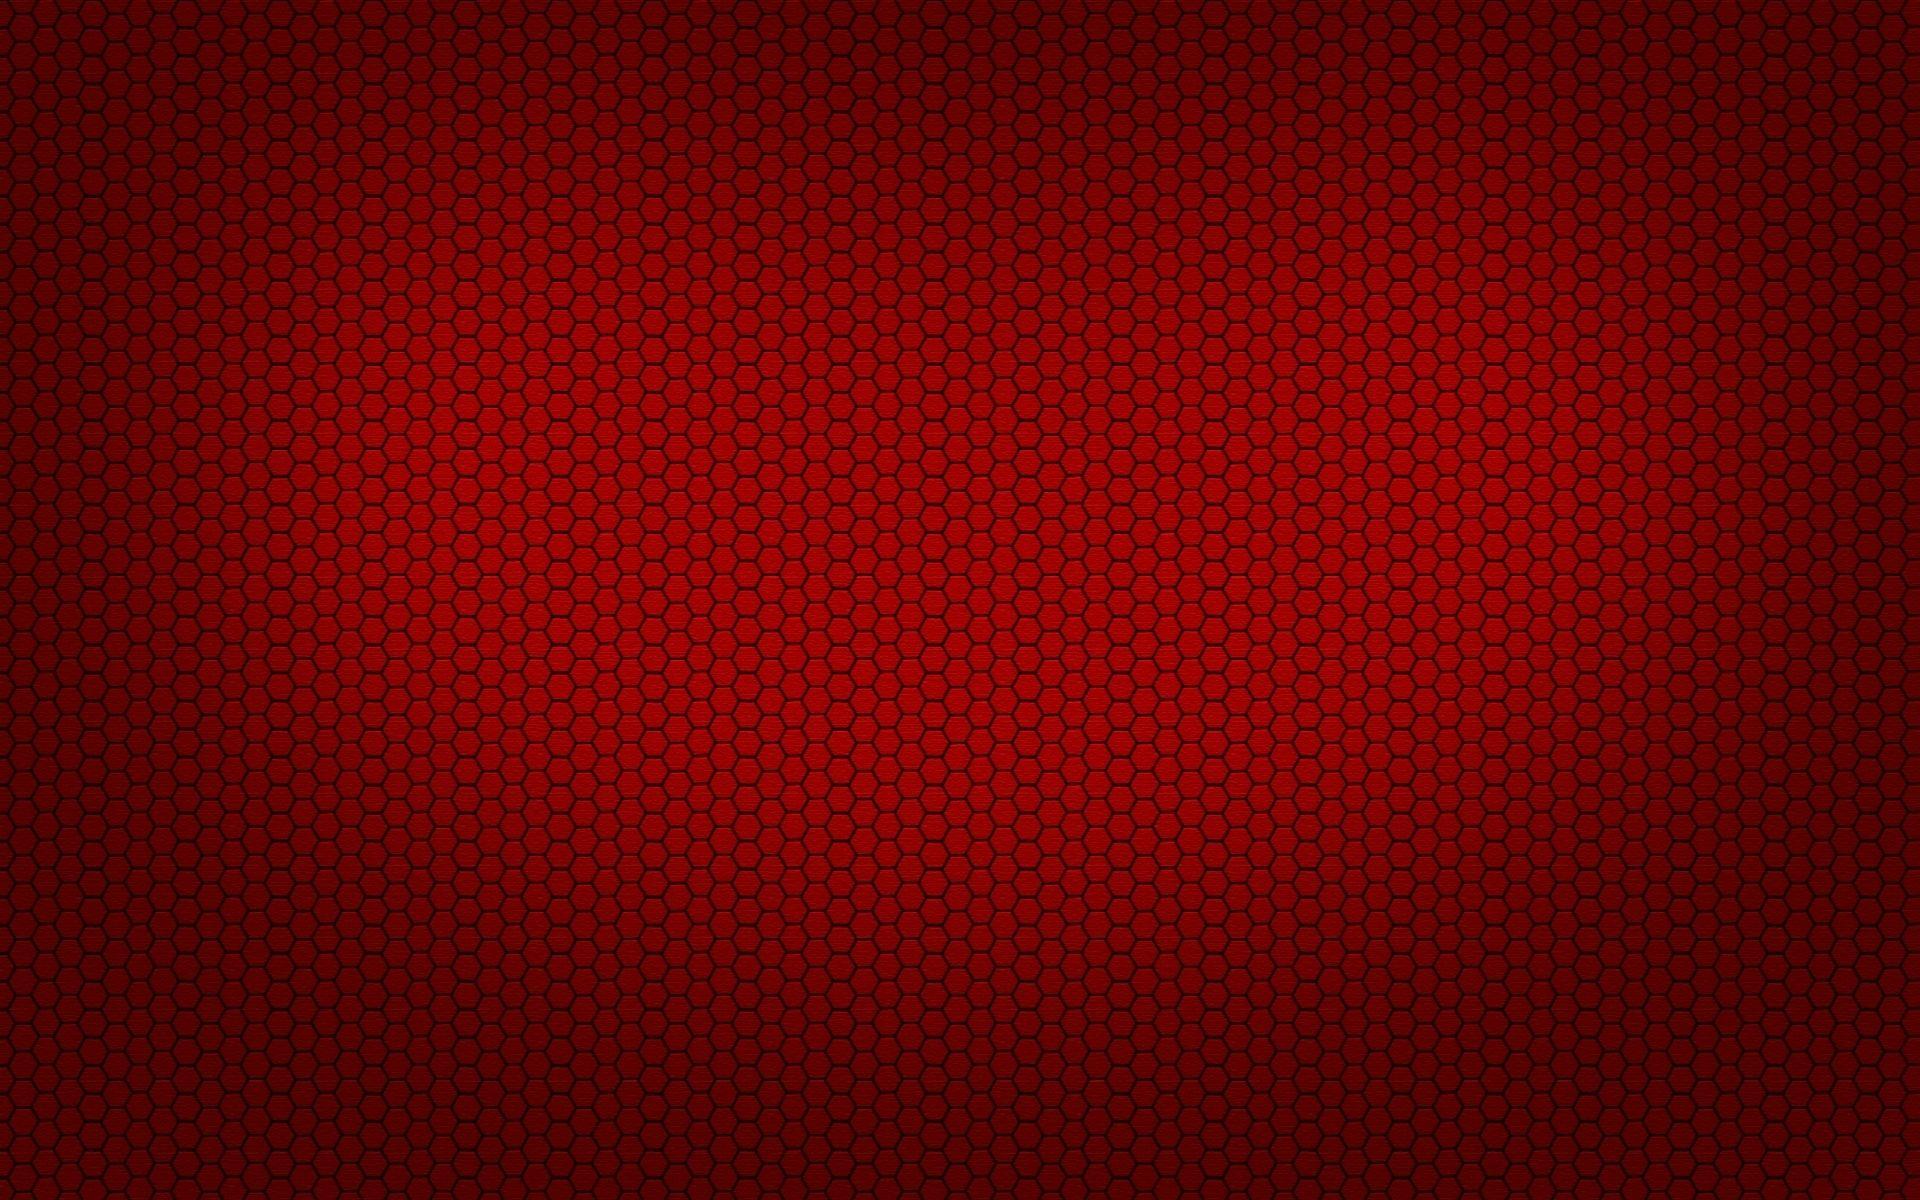 Black Elegant Wallpaper 8302 1920x1200 Px Freewallsource Com Rode Achtergrond Wallpaper Wallpapers